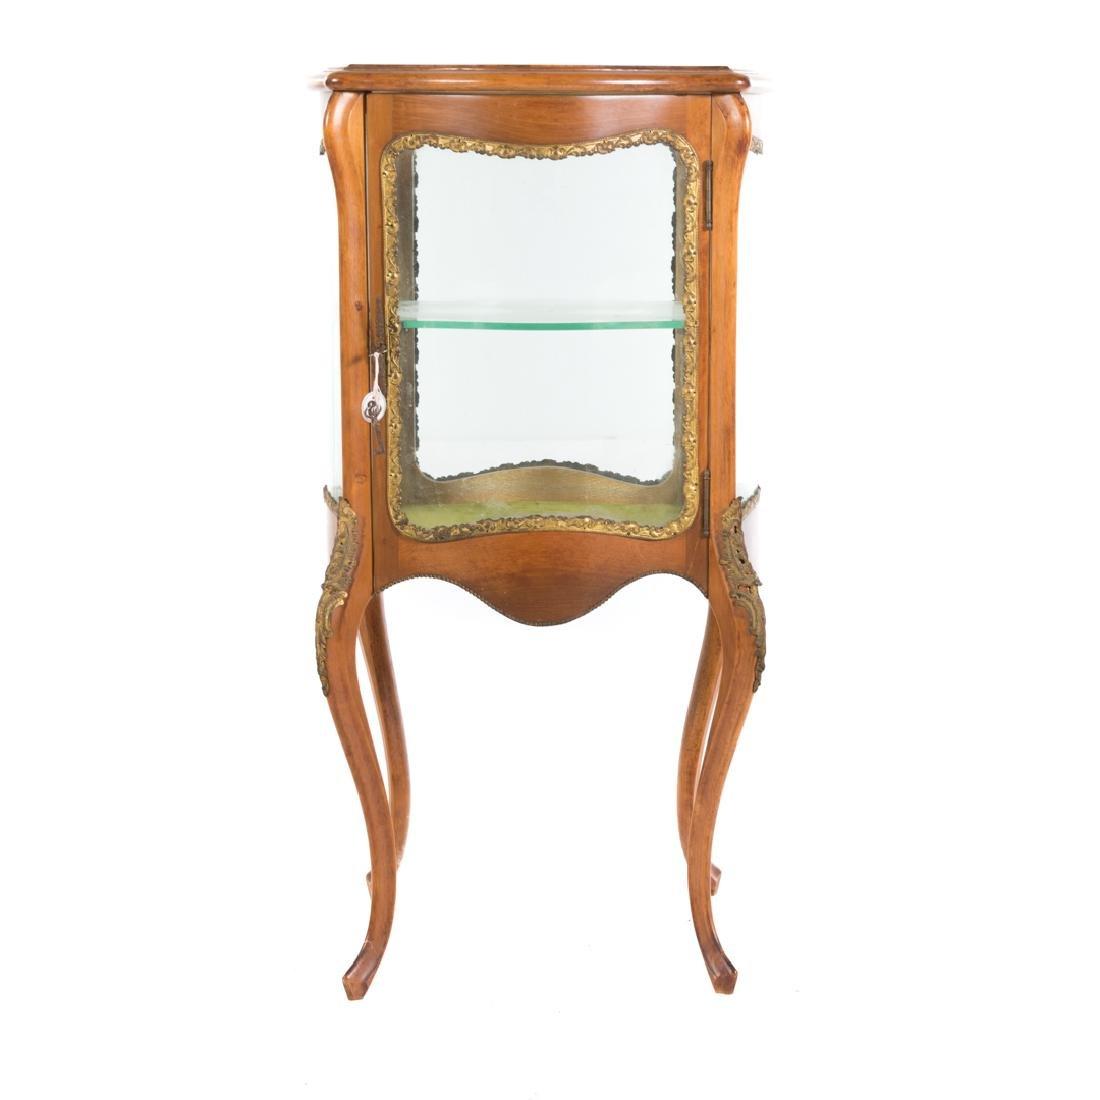 Louis XV style fruitwood brass mounted vitrine